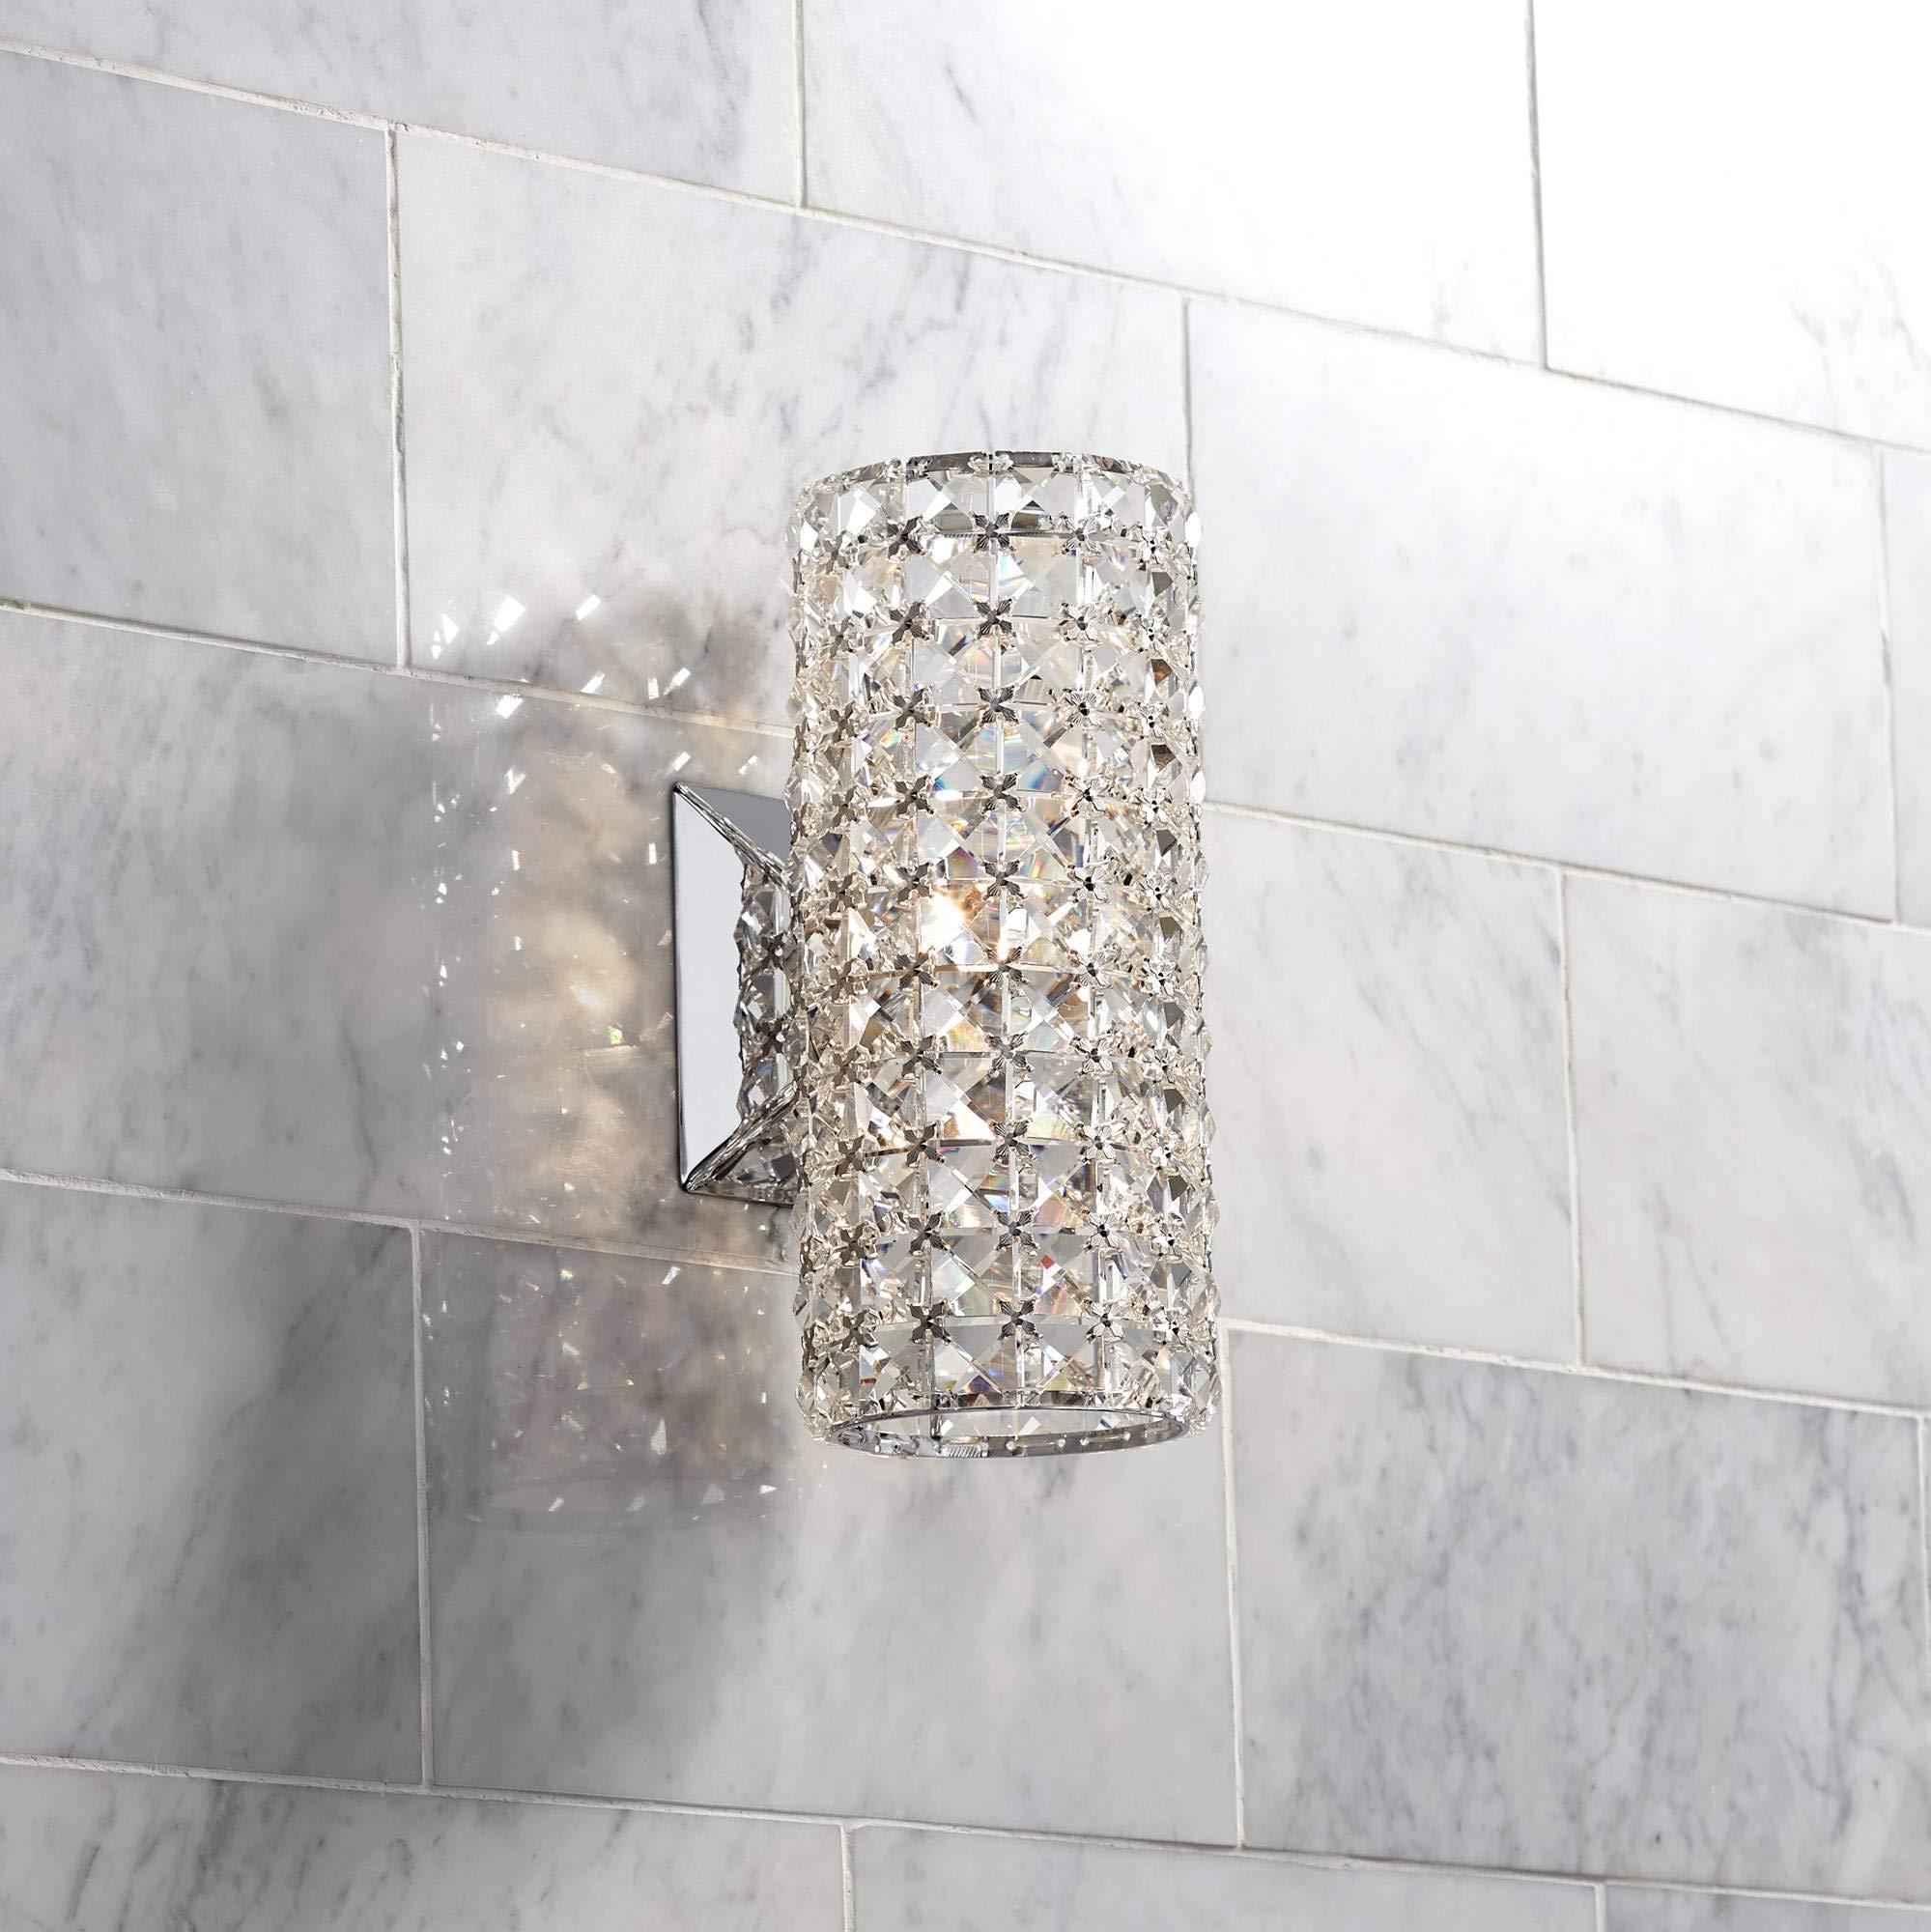 Bernadette 10 1/4'' High Crystal Cylinder Wall Sconce - Vienna Full Spectrum